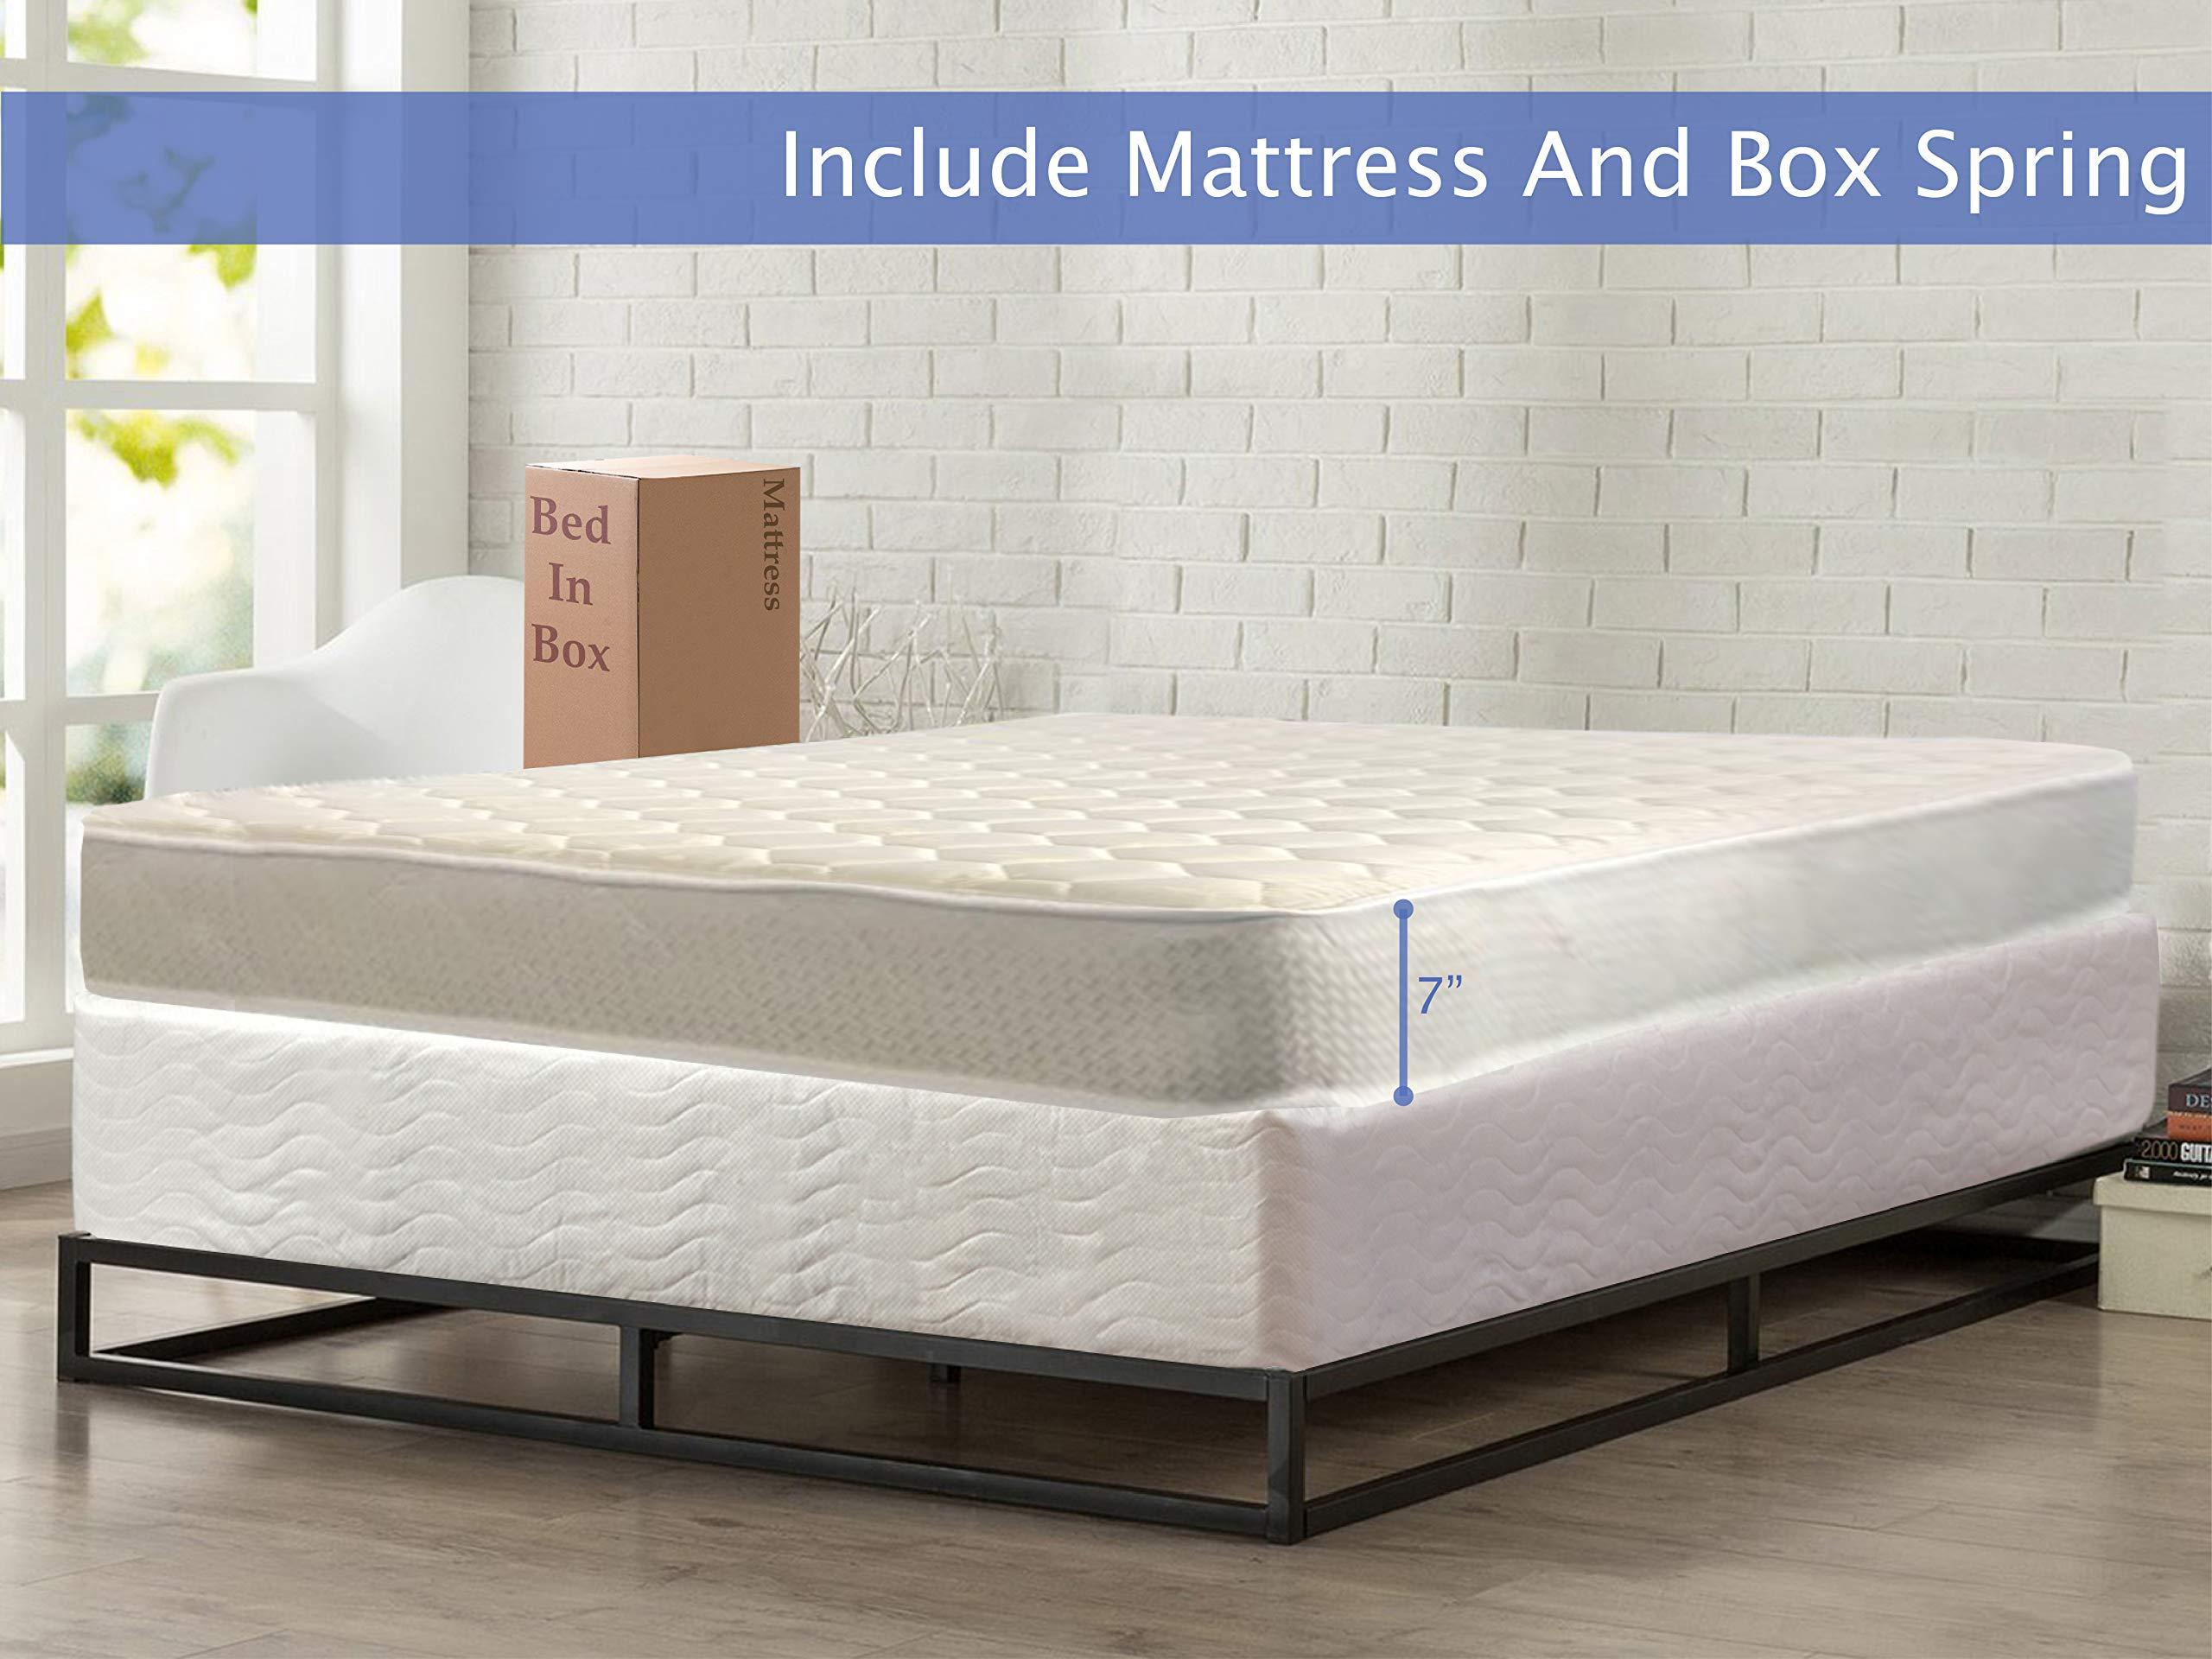 Nutan Medium Firm 7 inch High Density Poly Foam Mattress And 8-Inch Unassembled Wood Boxspring/Foundation Set,Twin Size, Beige by Nutan